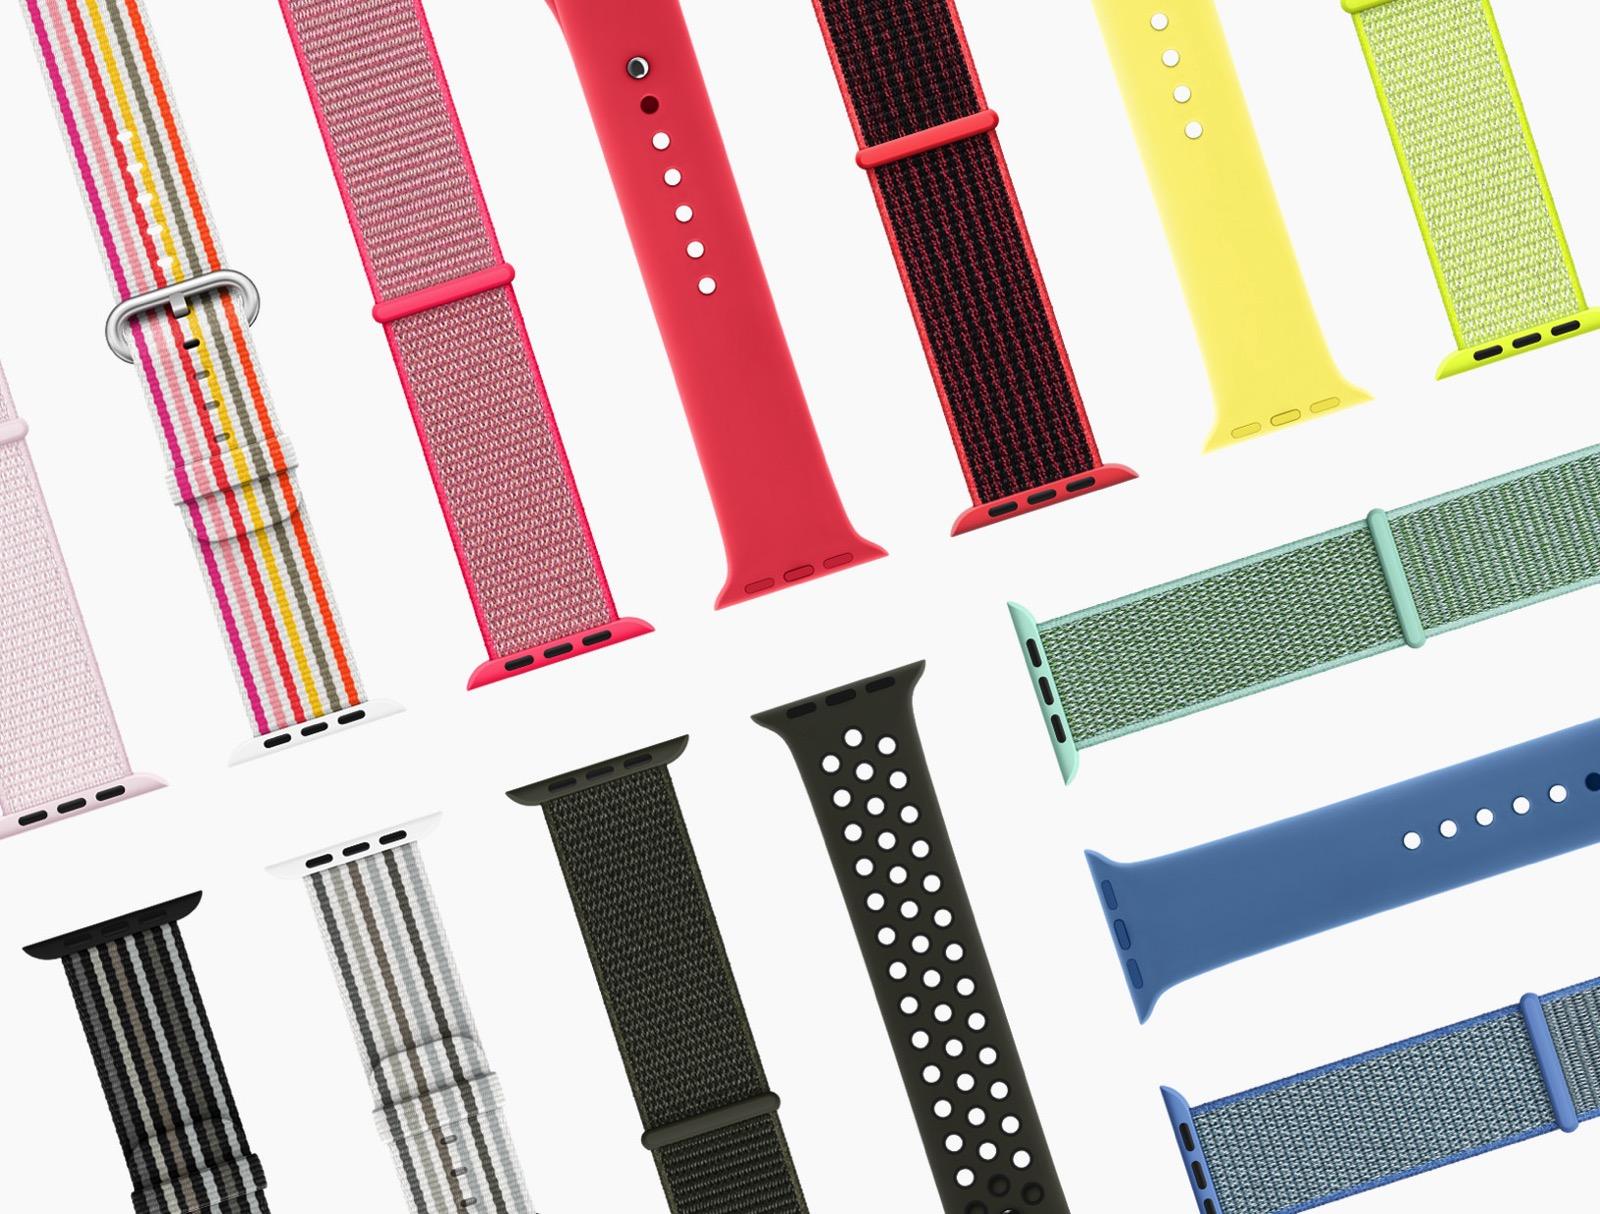 Apple-Watch-Series3_springbands_032118.jpg